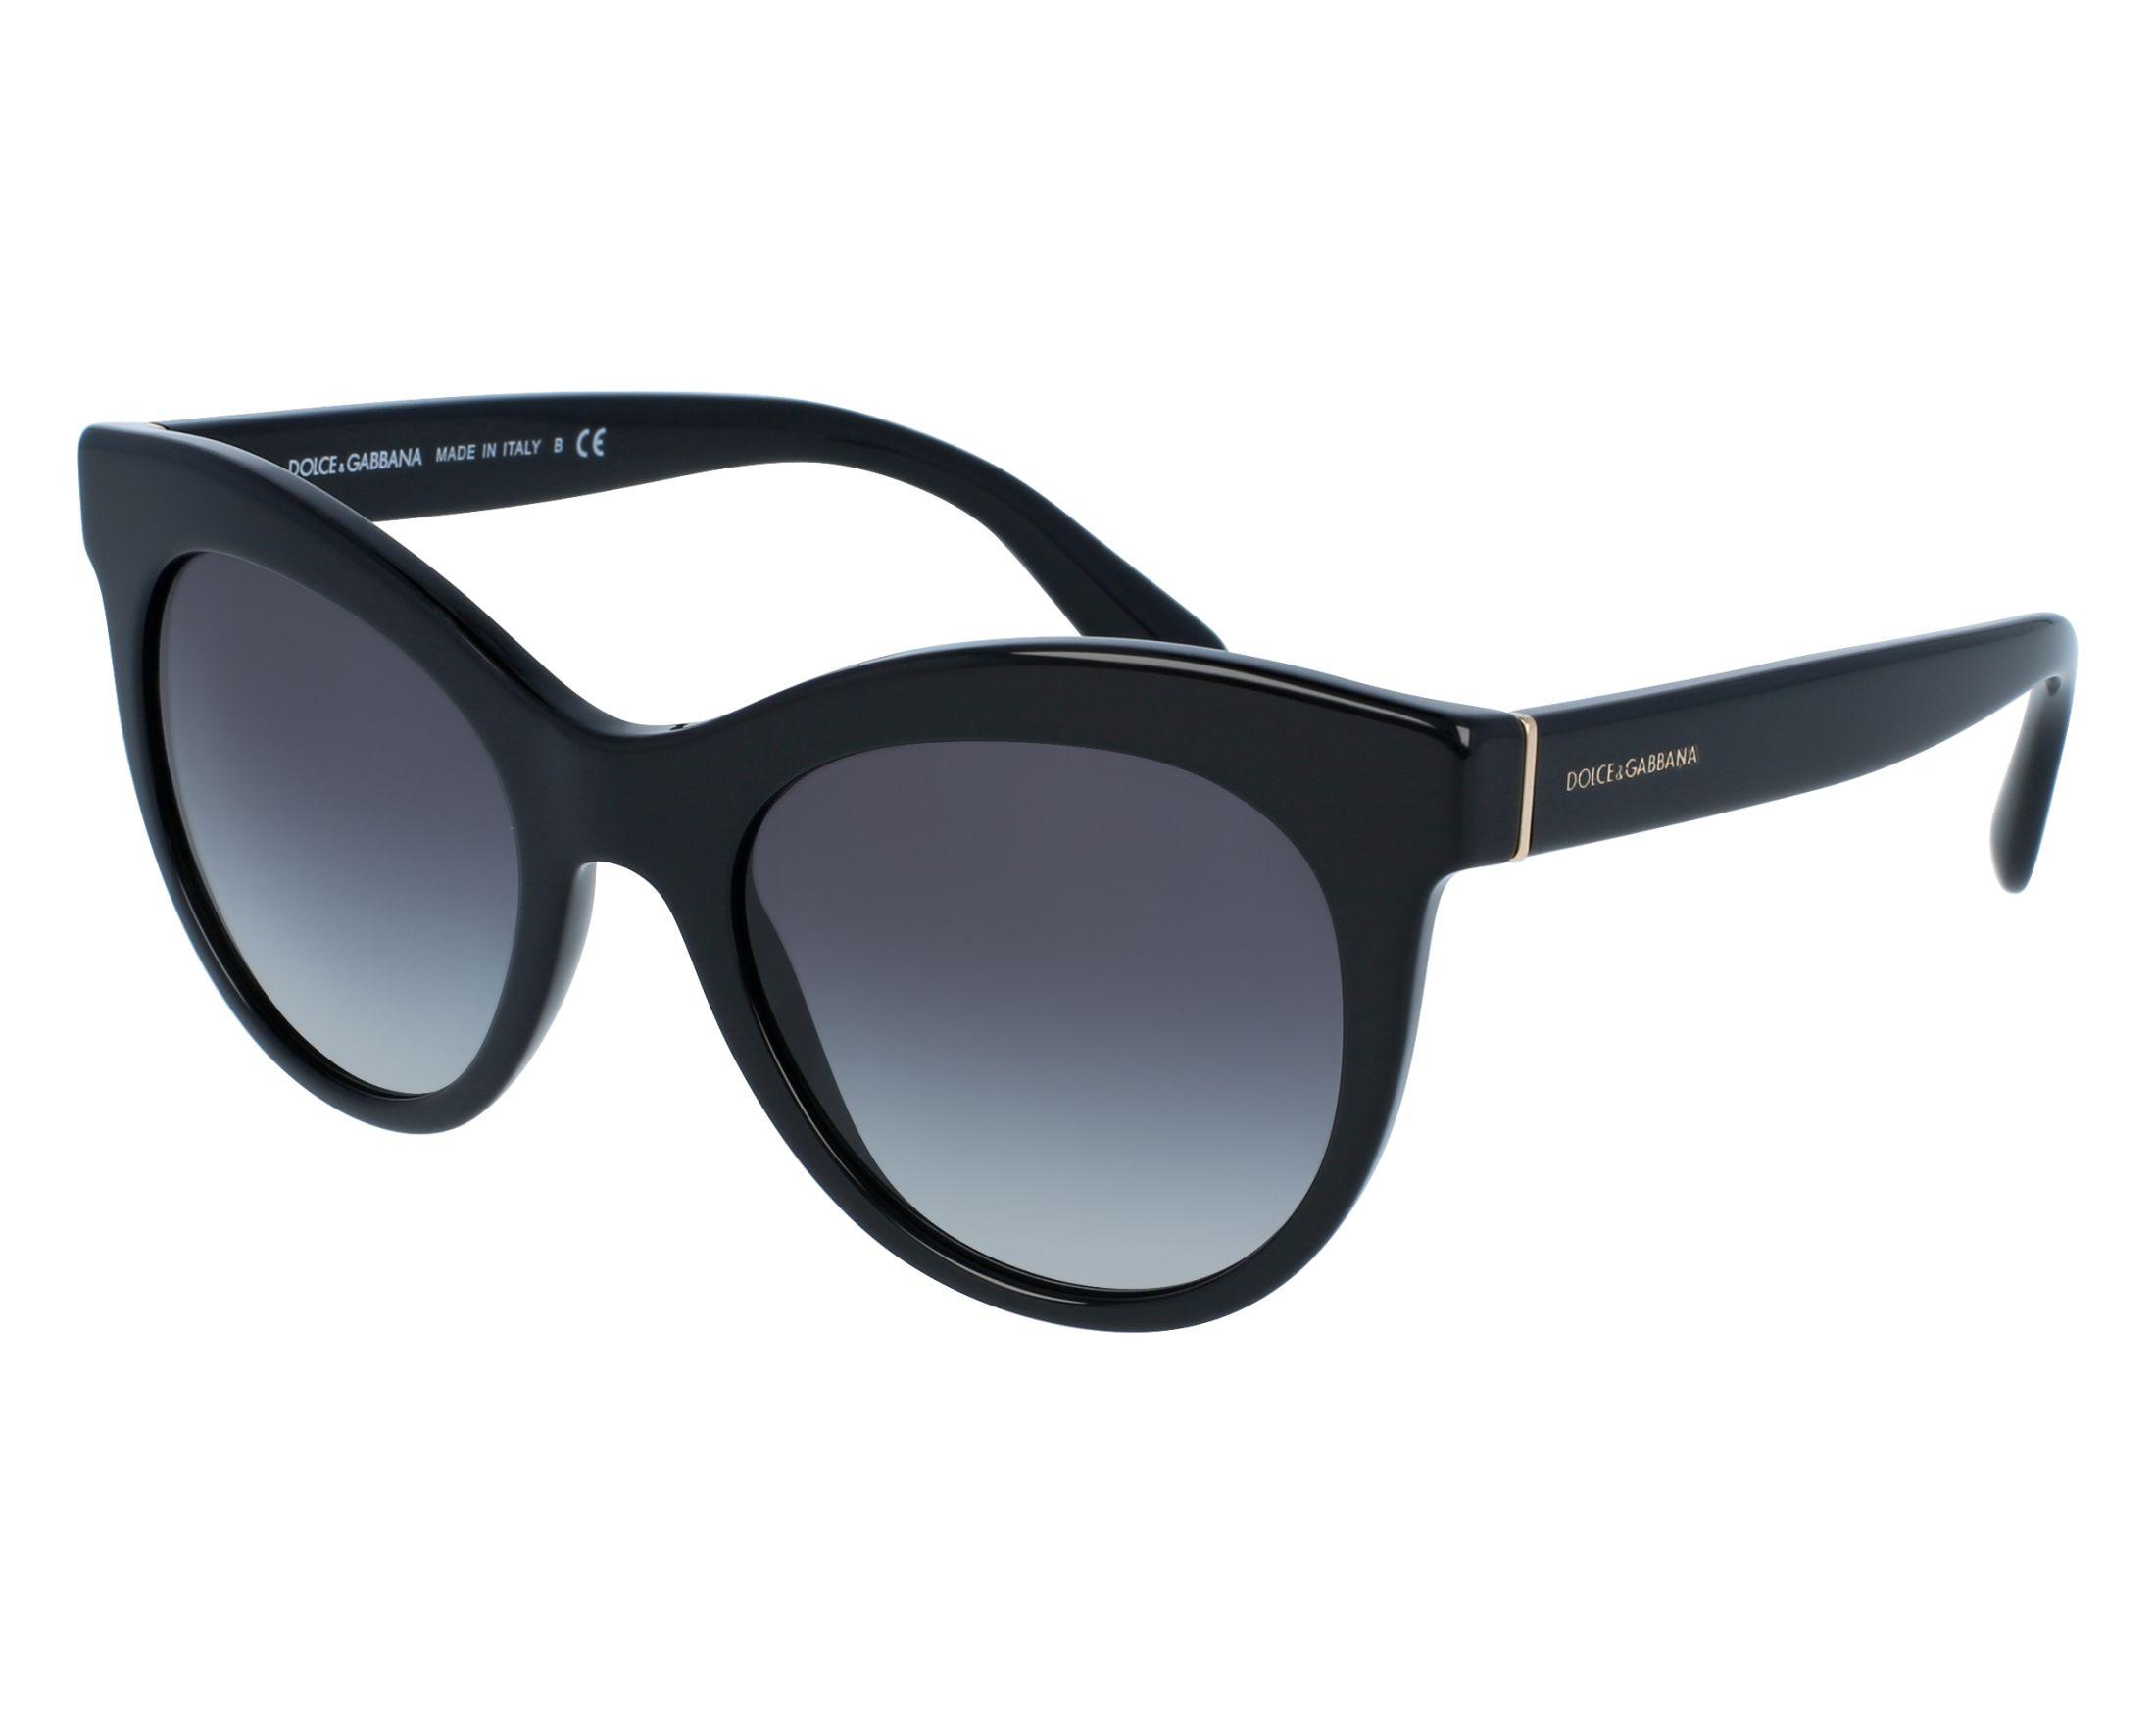 Dolce & Gabbana DG 4311 501/8G Größe 51 5cqJsbp8